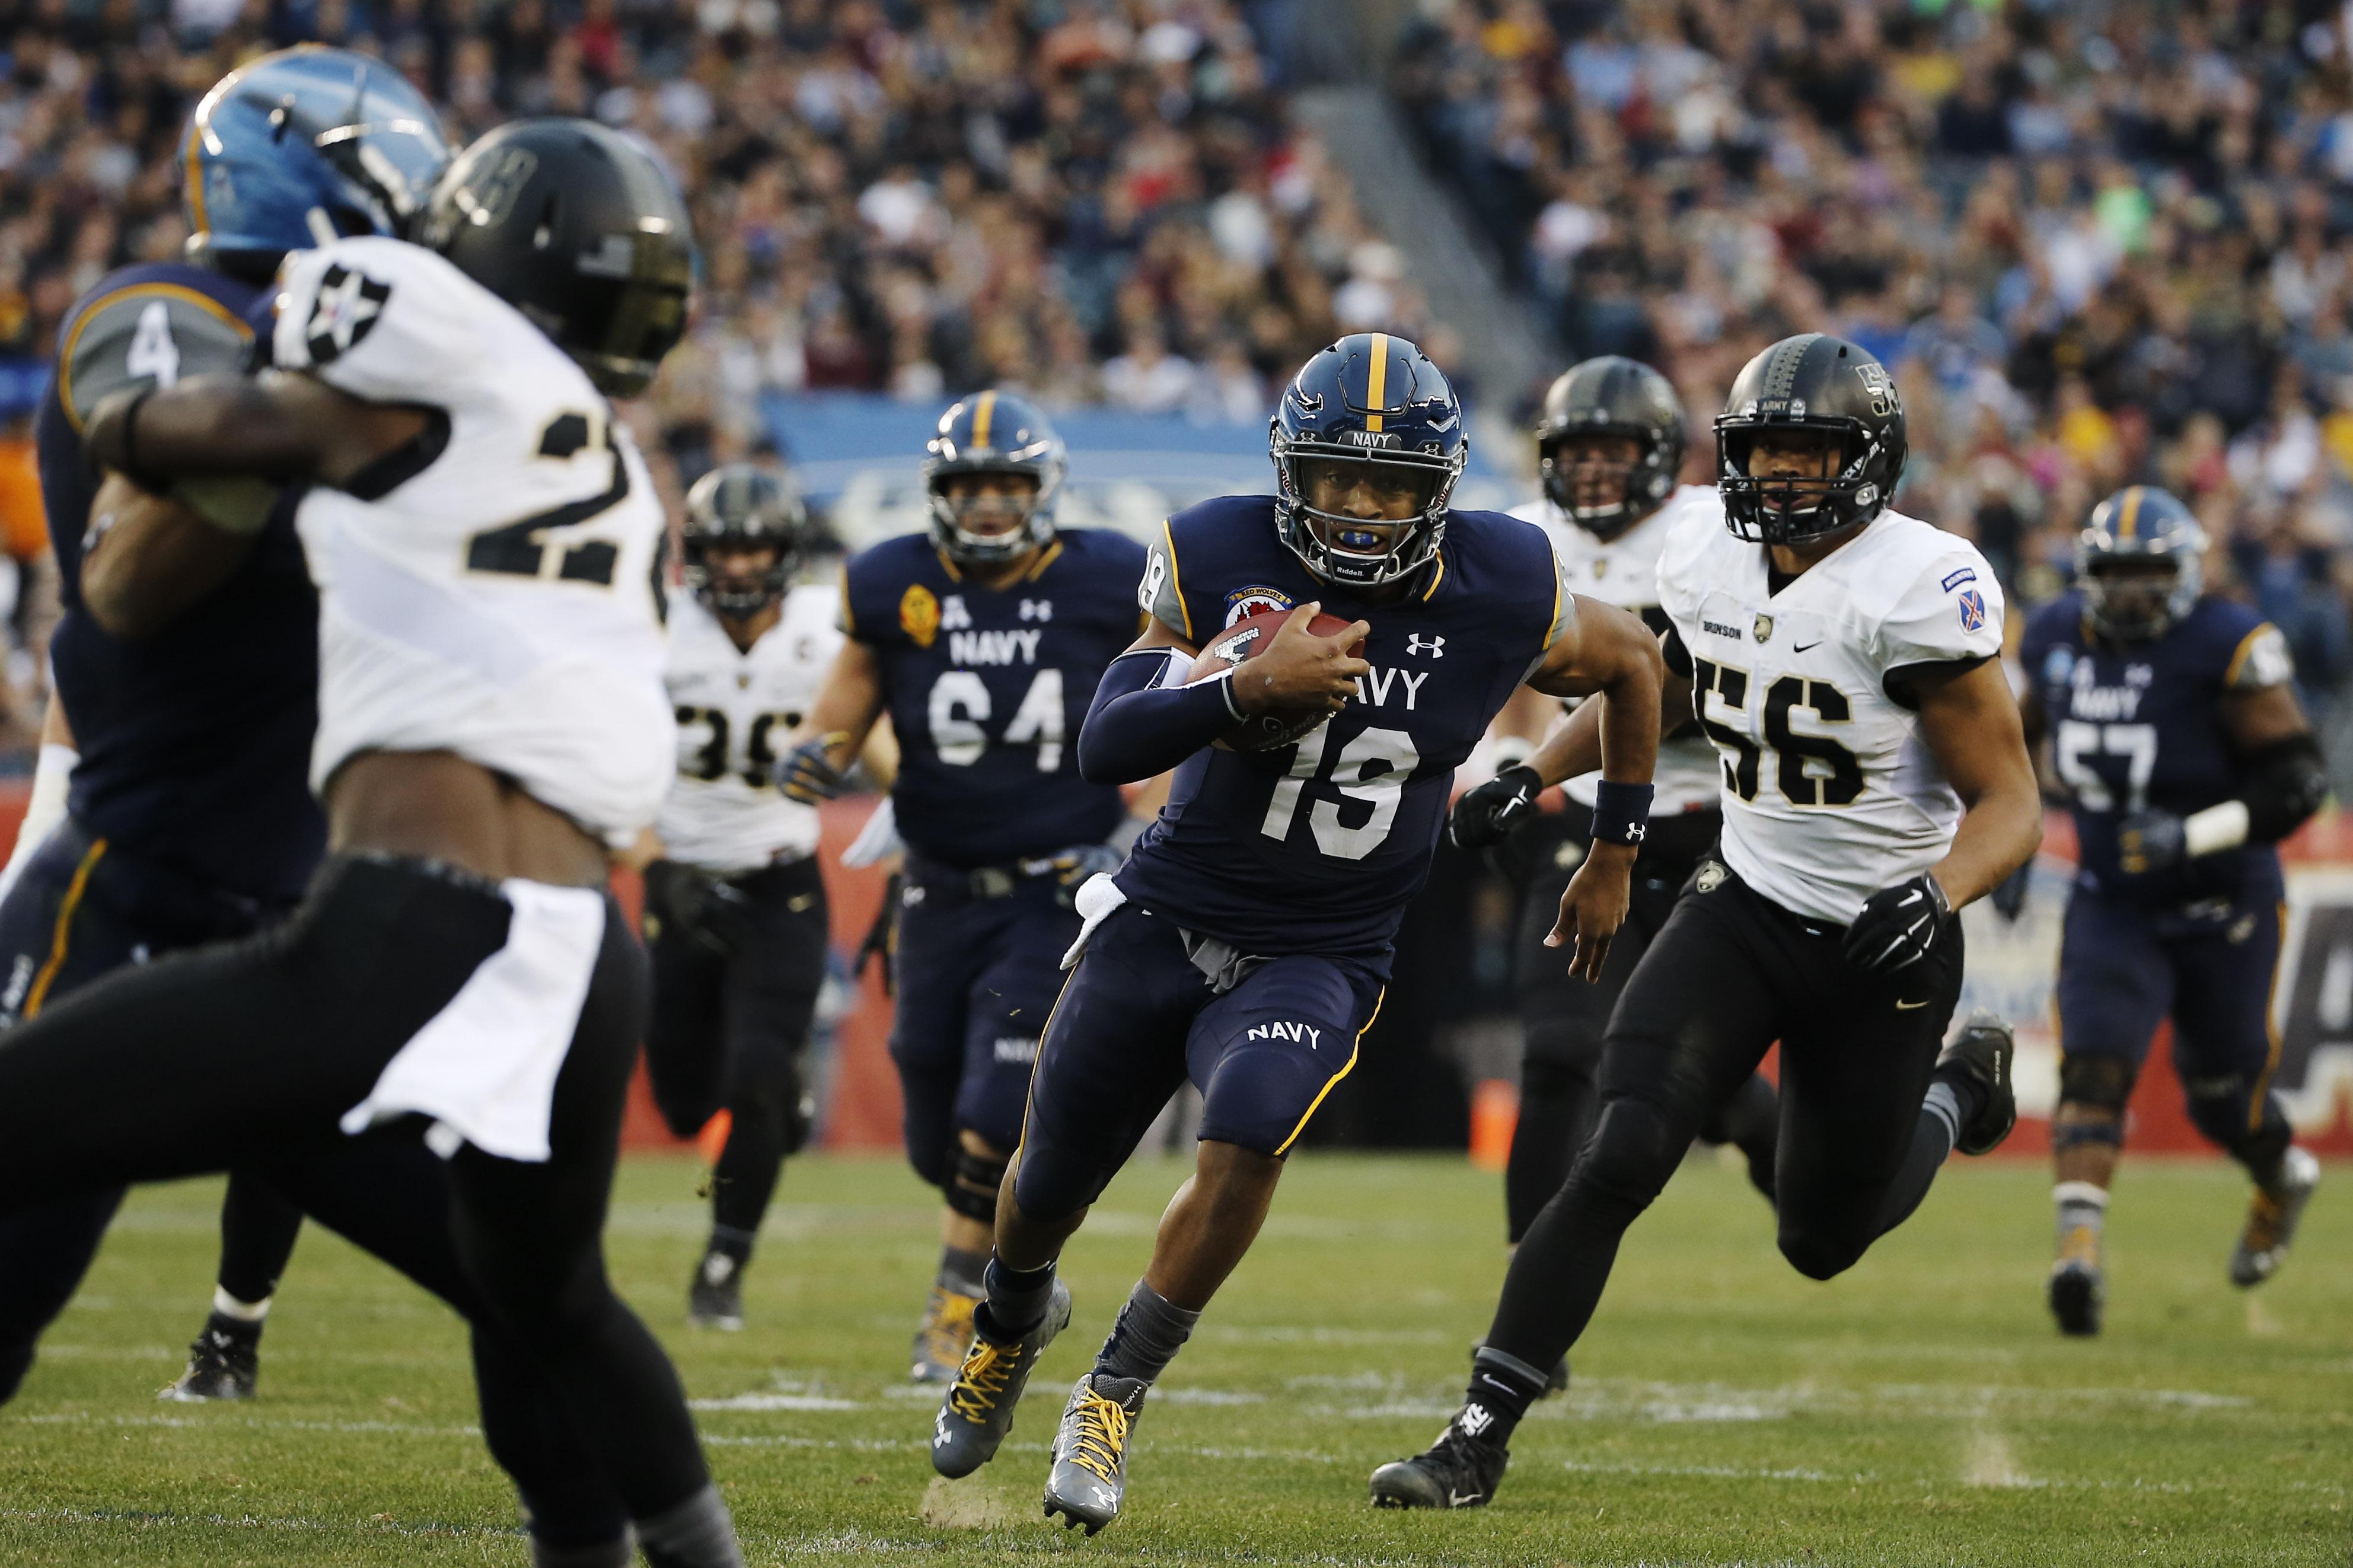 Navy quarterback Keenan Reynolds (19) rushes during an NCAA college football game against Army Saturday, Dec. 12, 2015, in Philadelphia. (AP Photo/Matt Slocum)